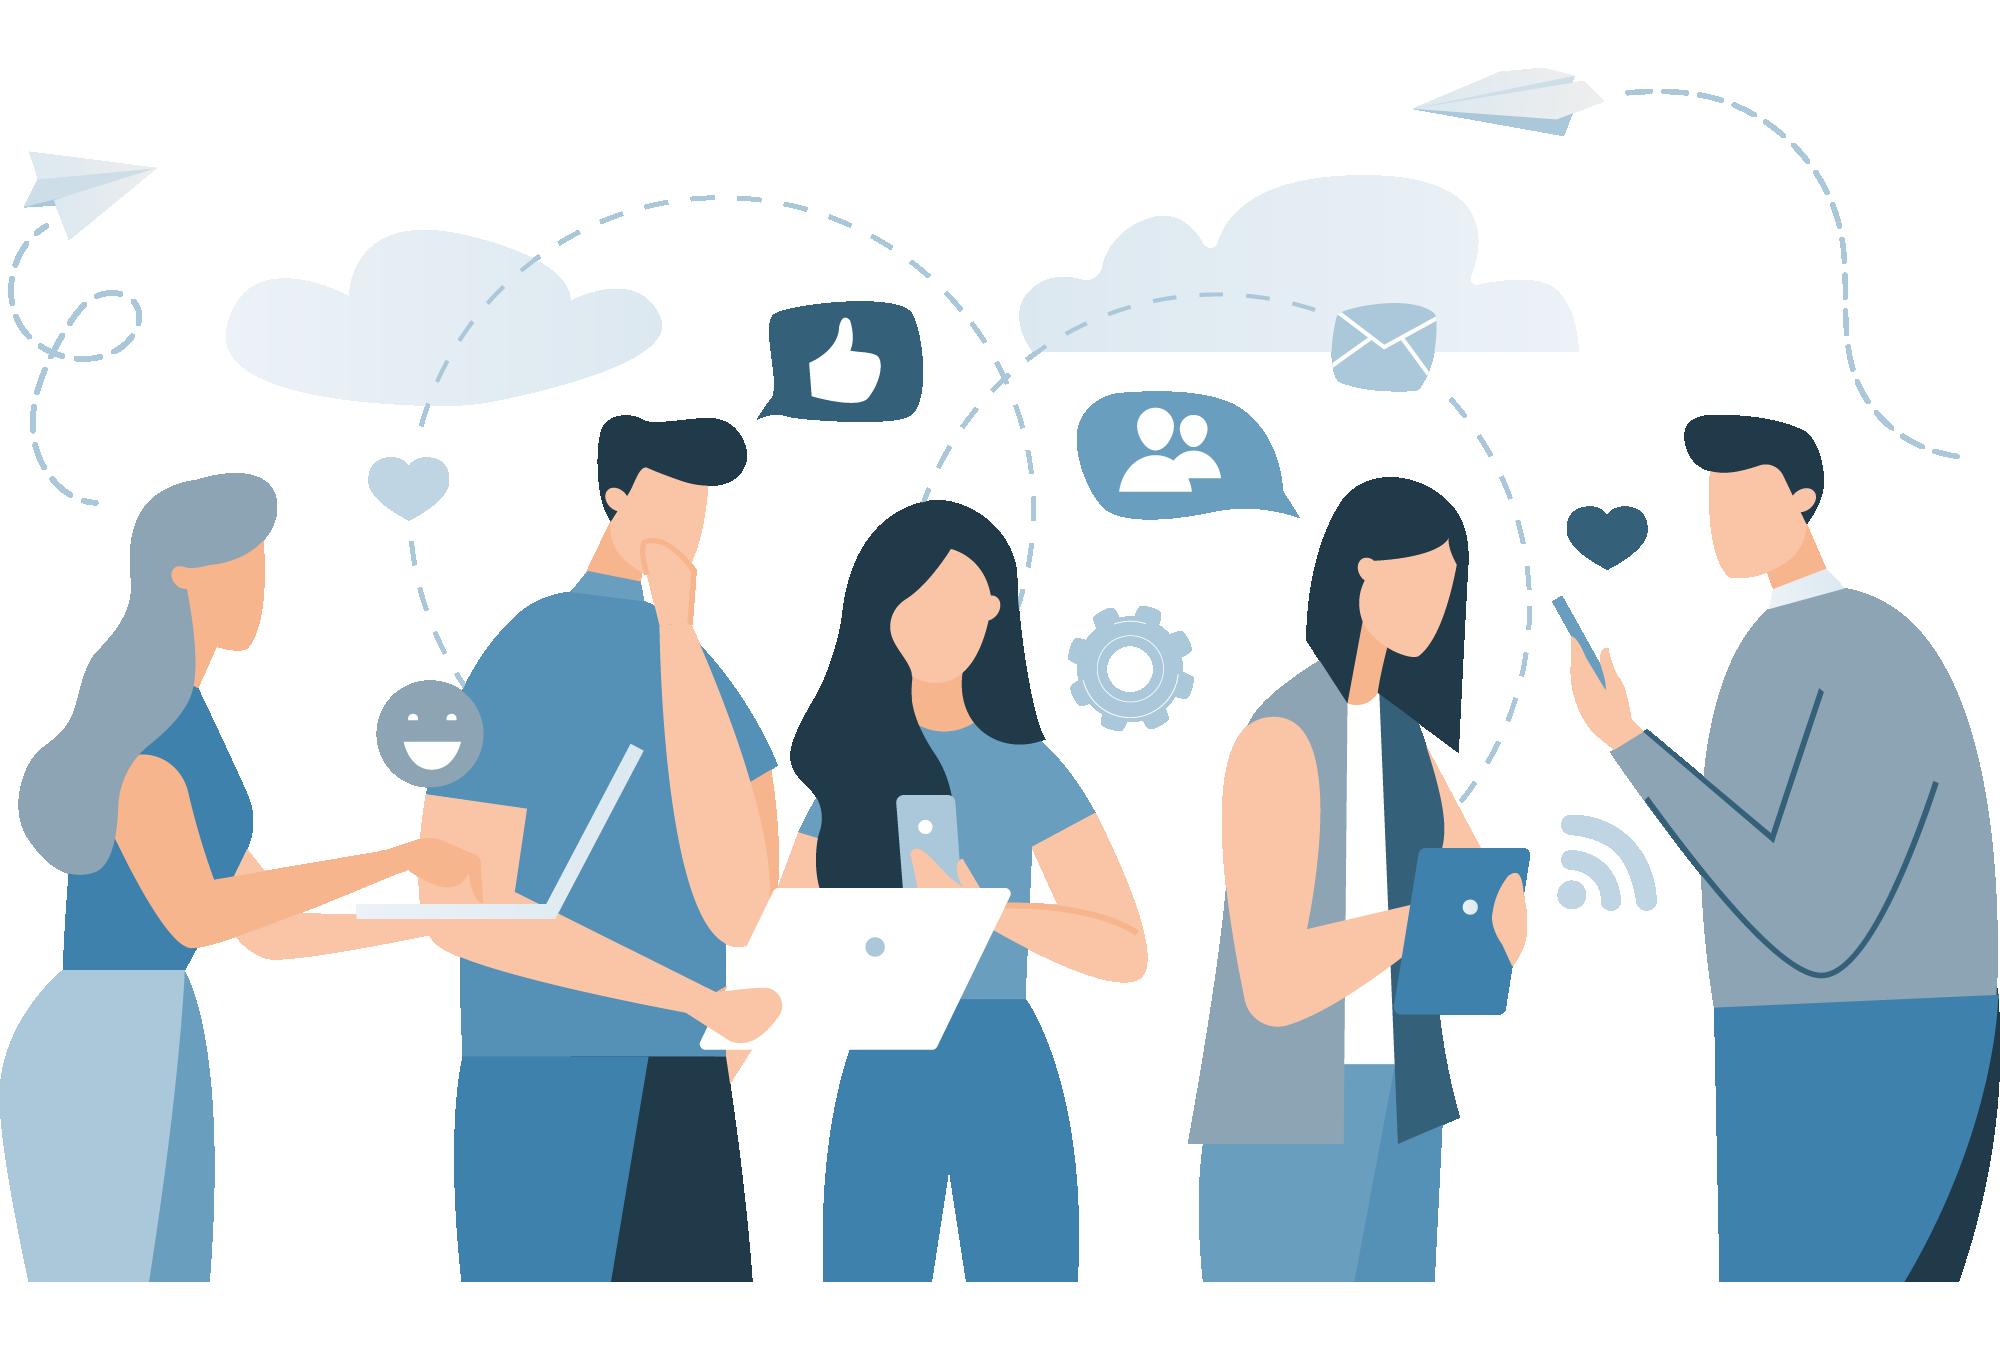 Connect communities